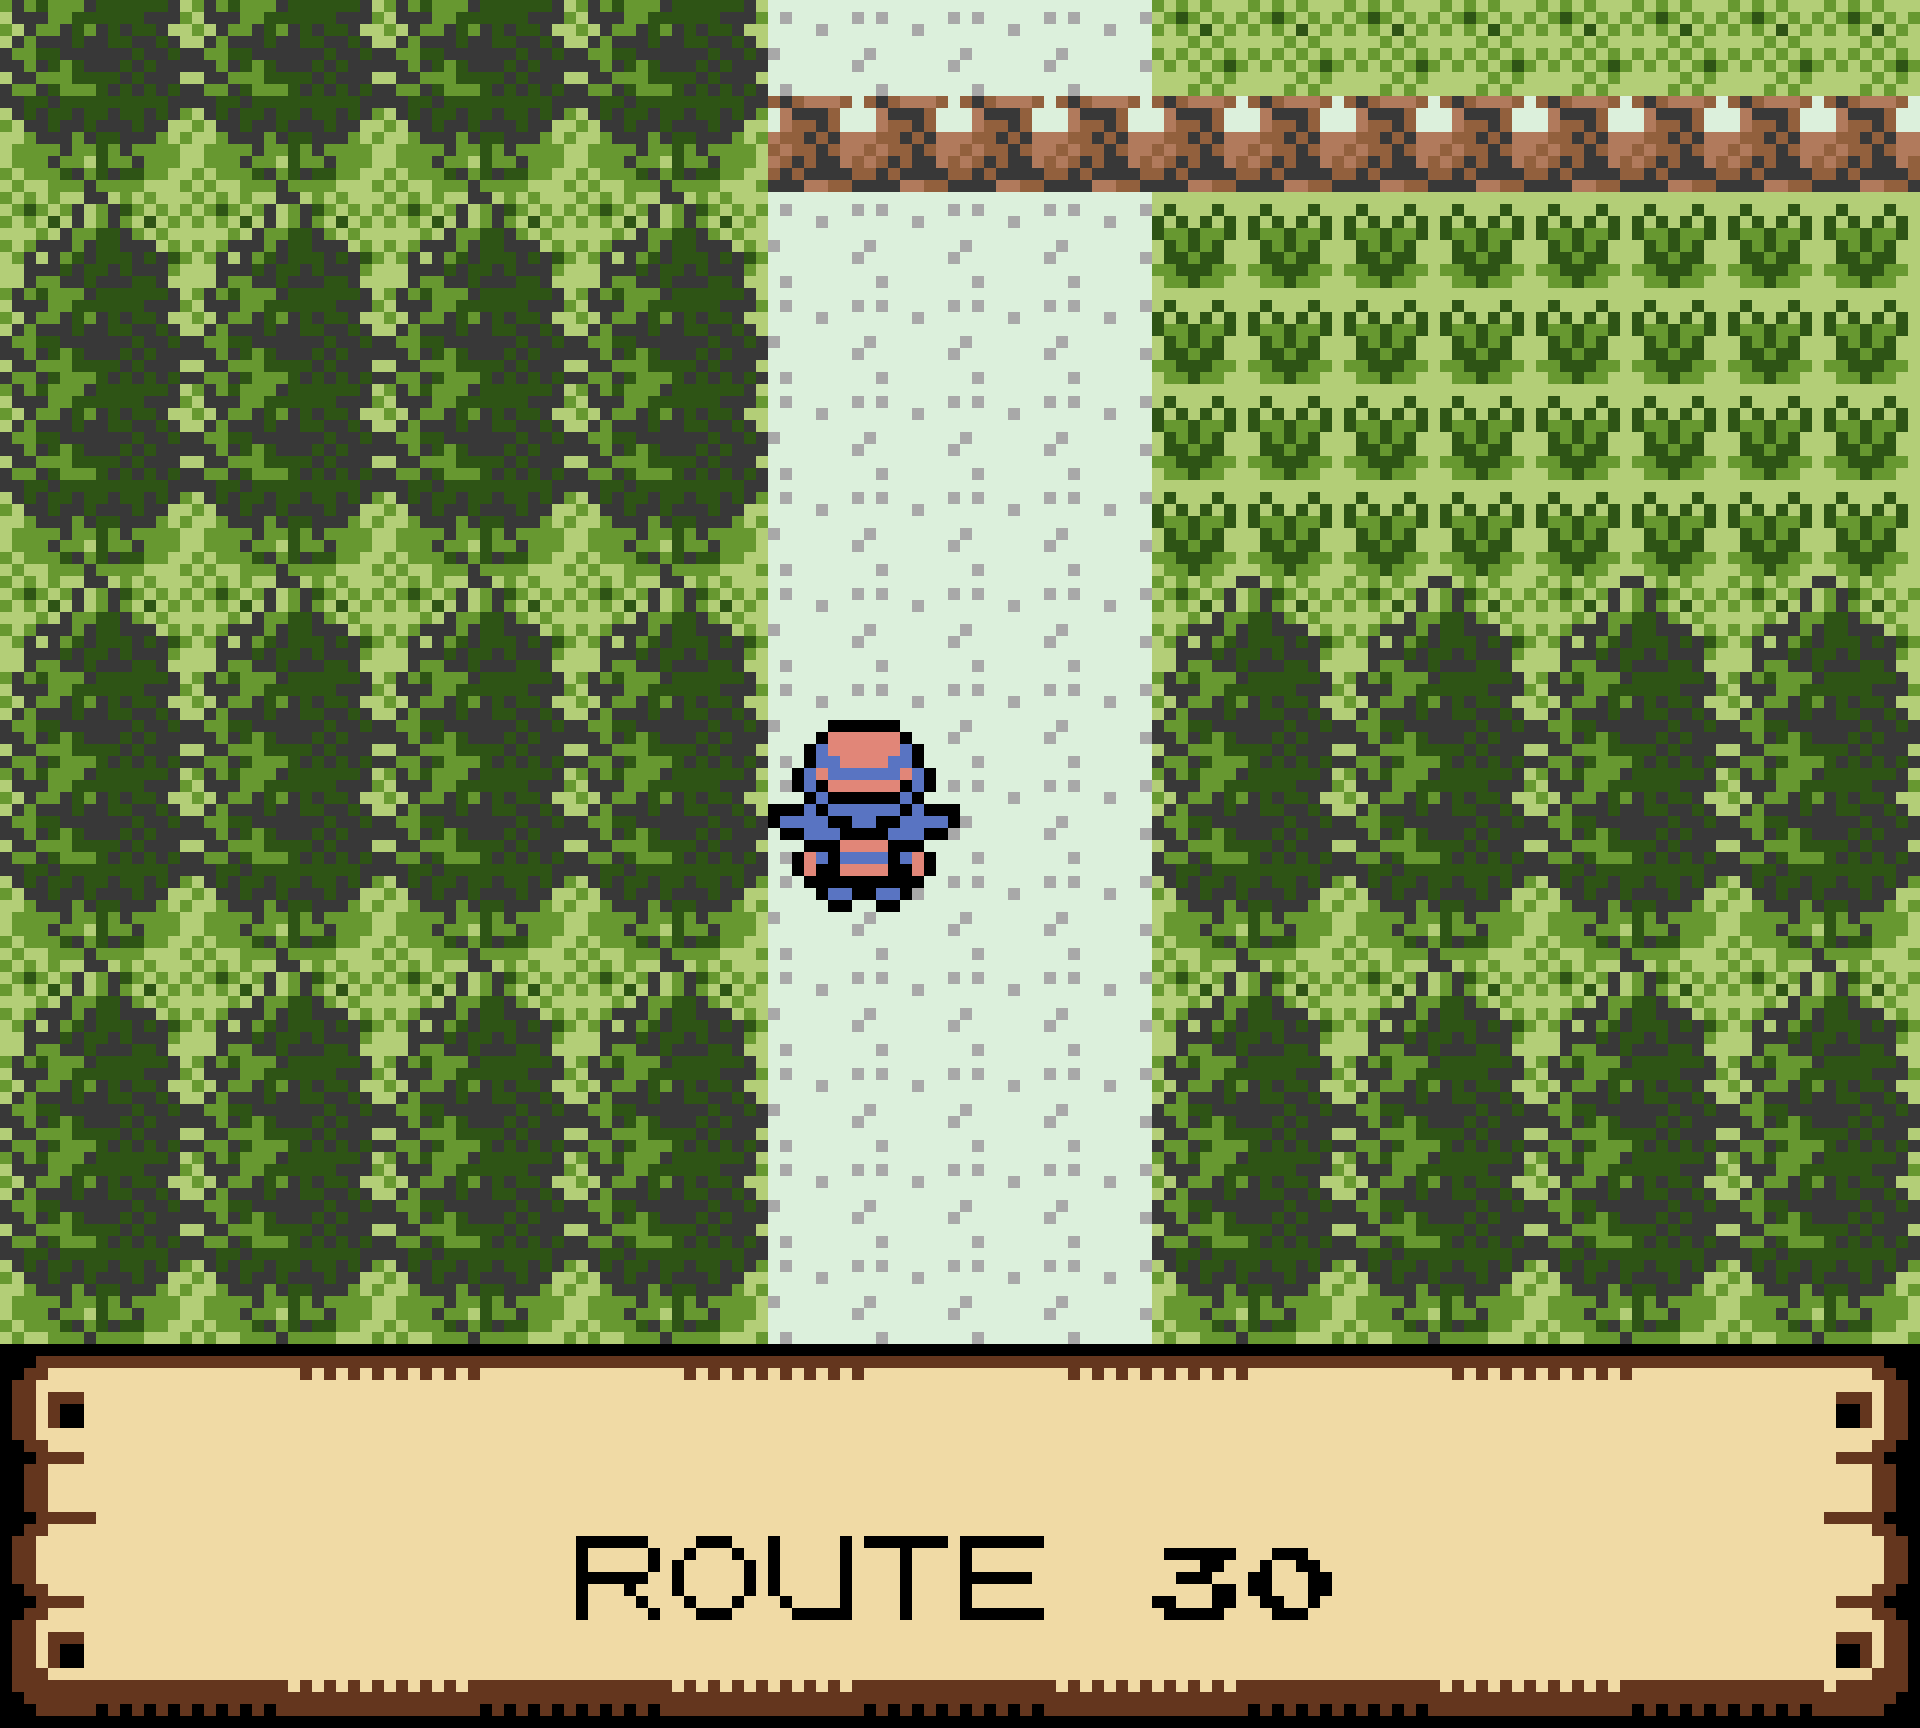 Pokemon_Crystal_Nuzlocke_2021-10-14_16.46.42.png